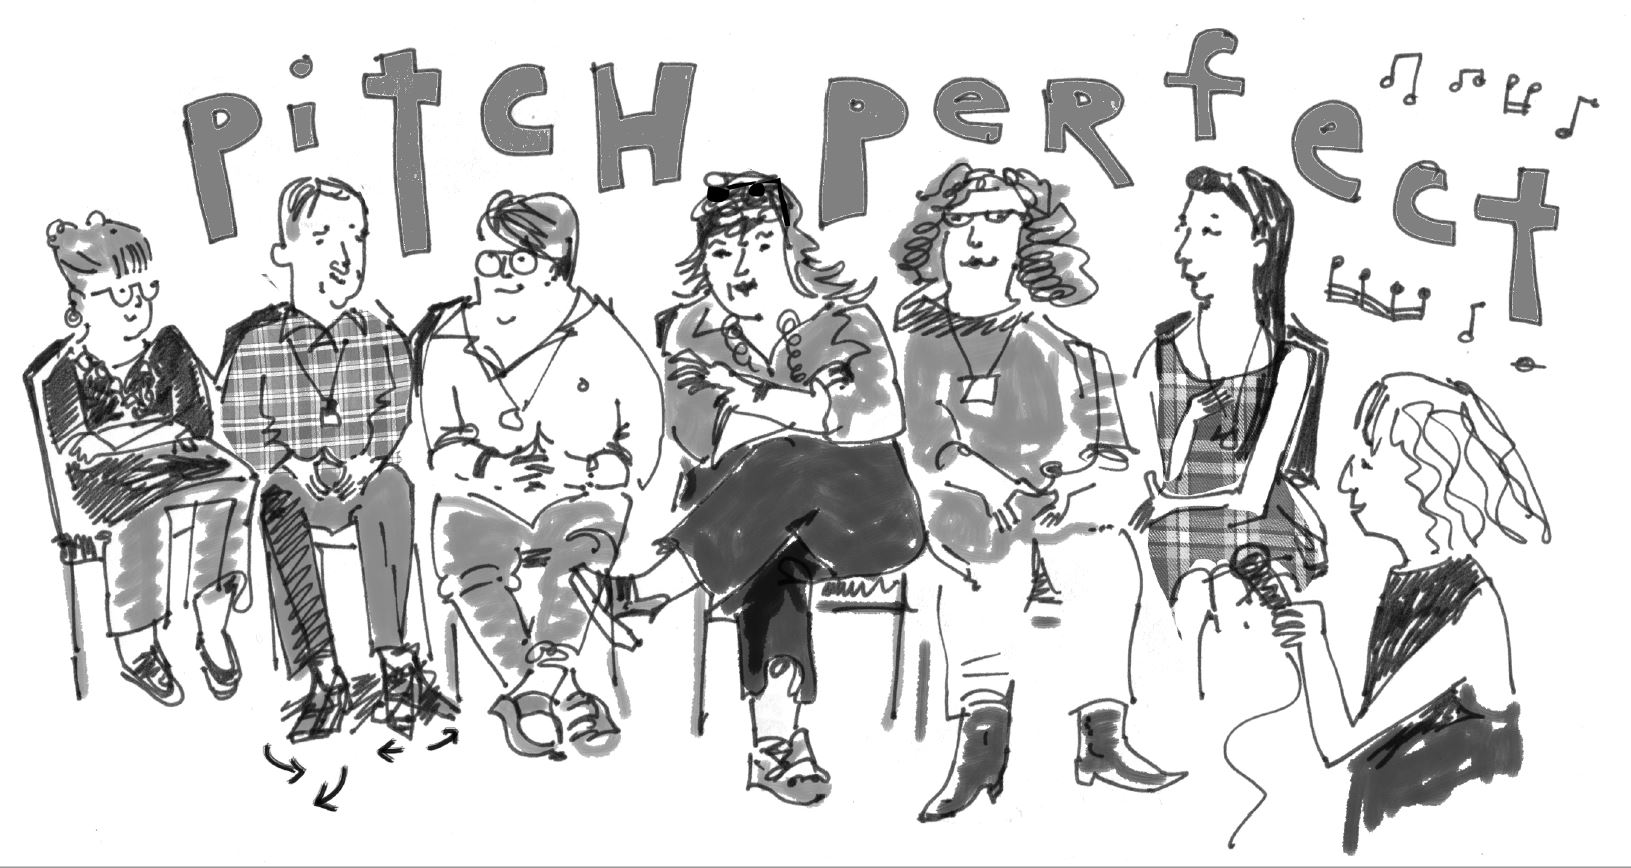 Illustration courtesy of Liz Anelli - the Panel